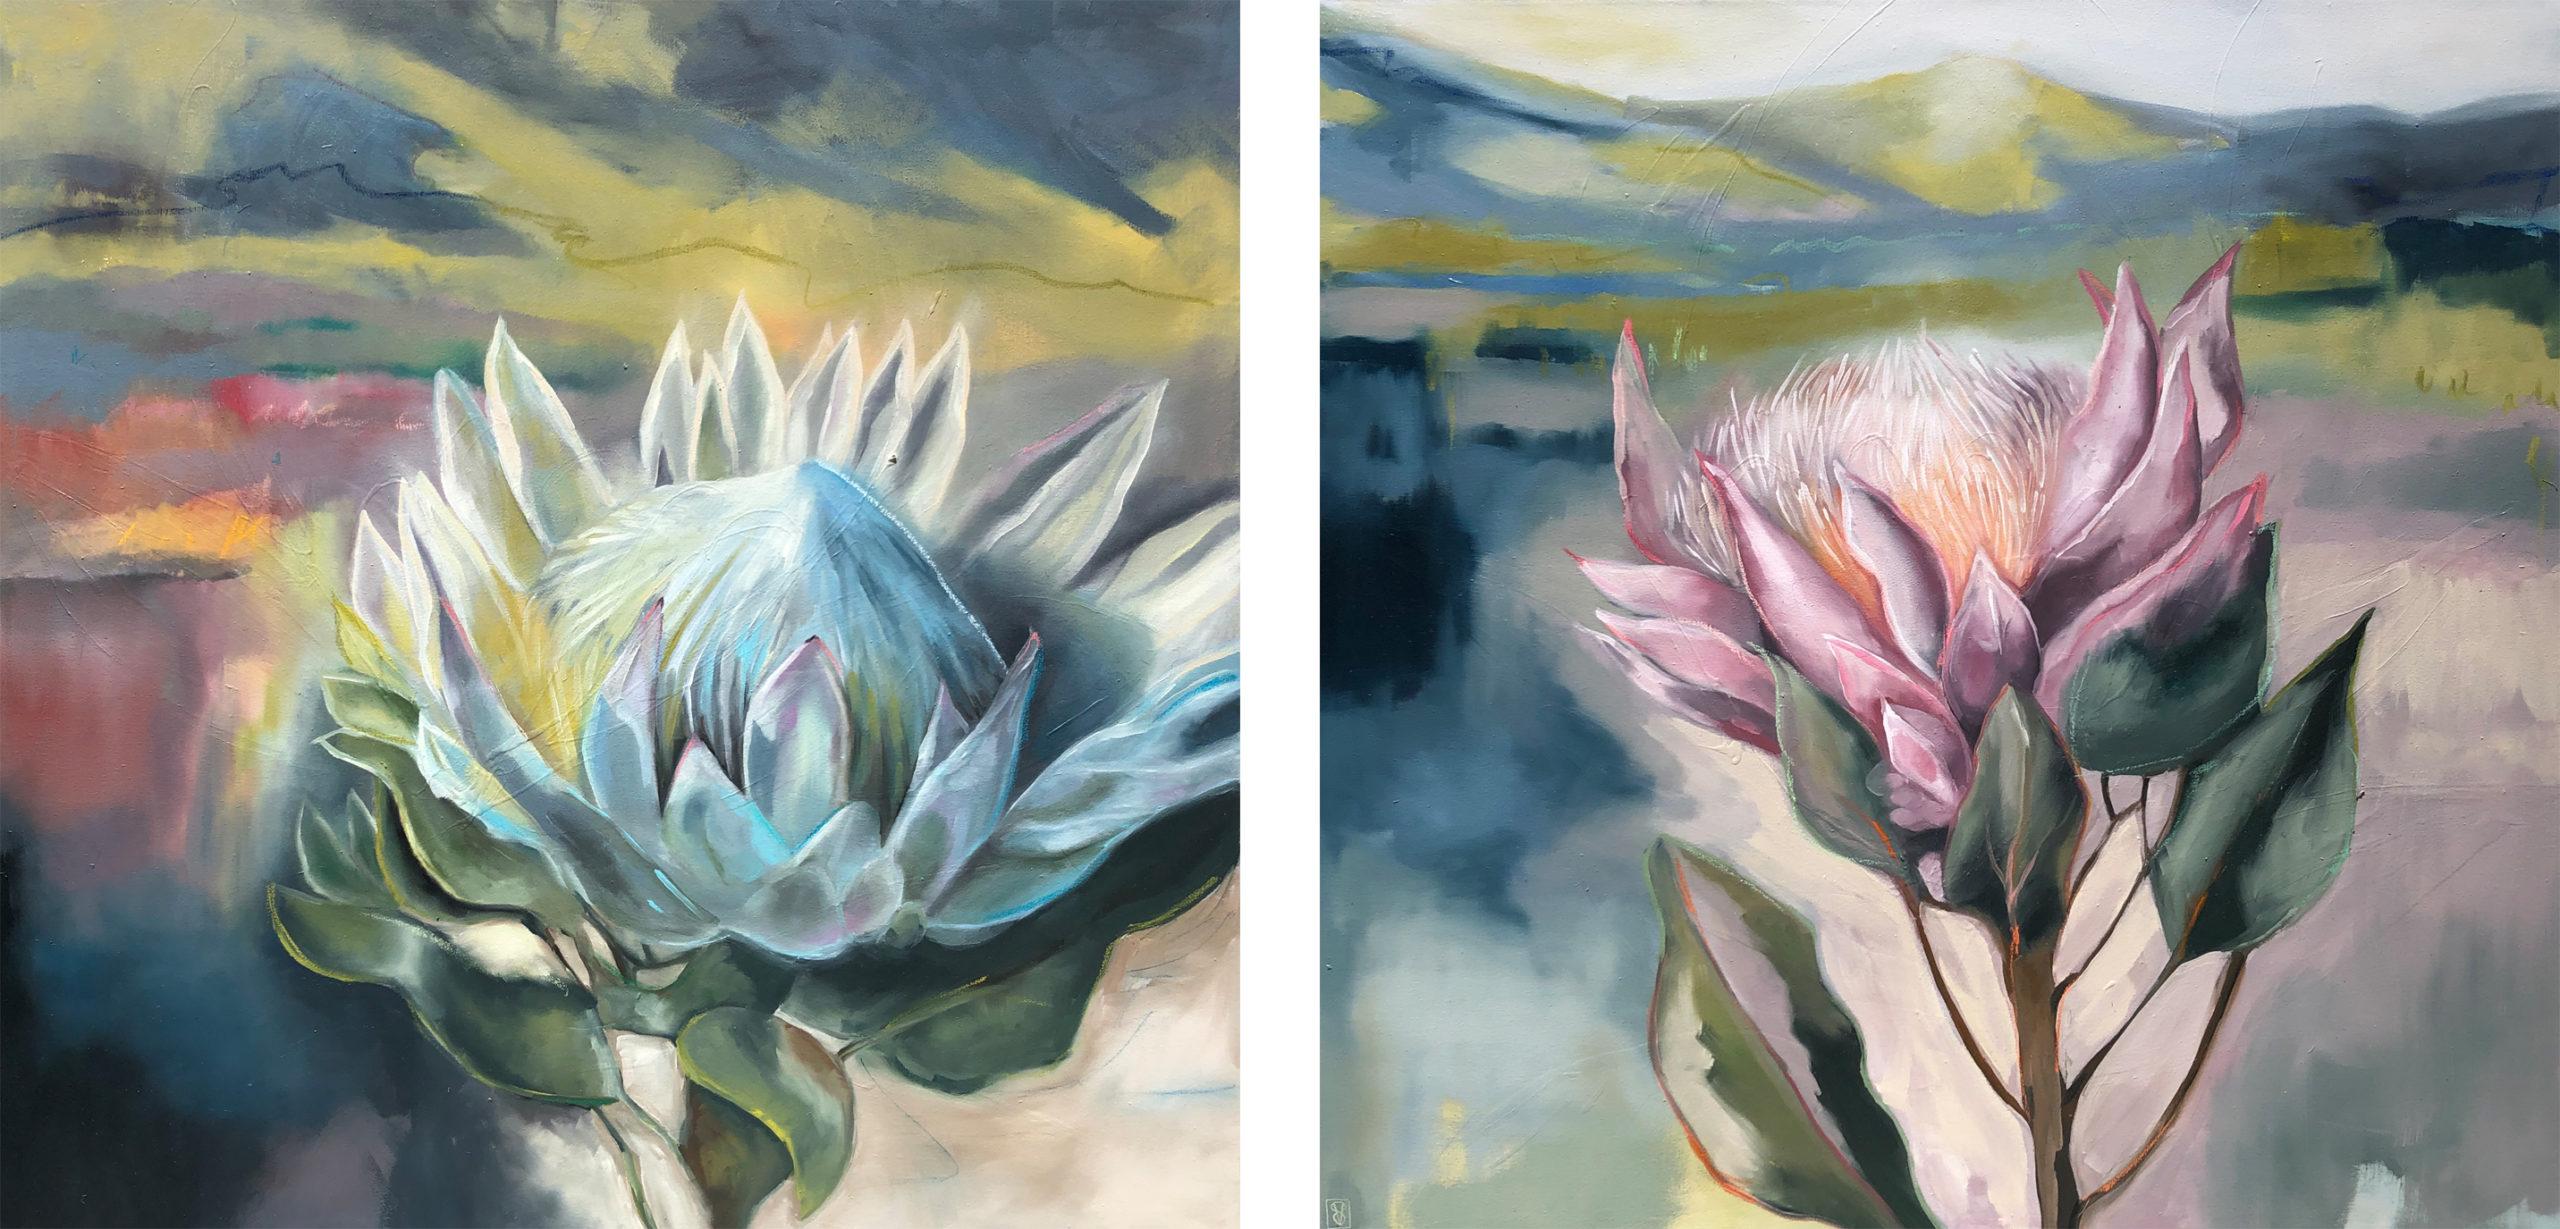 Vicky Sanders Protea - Kim's Proteas